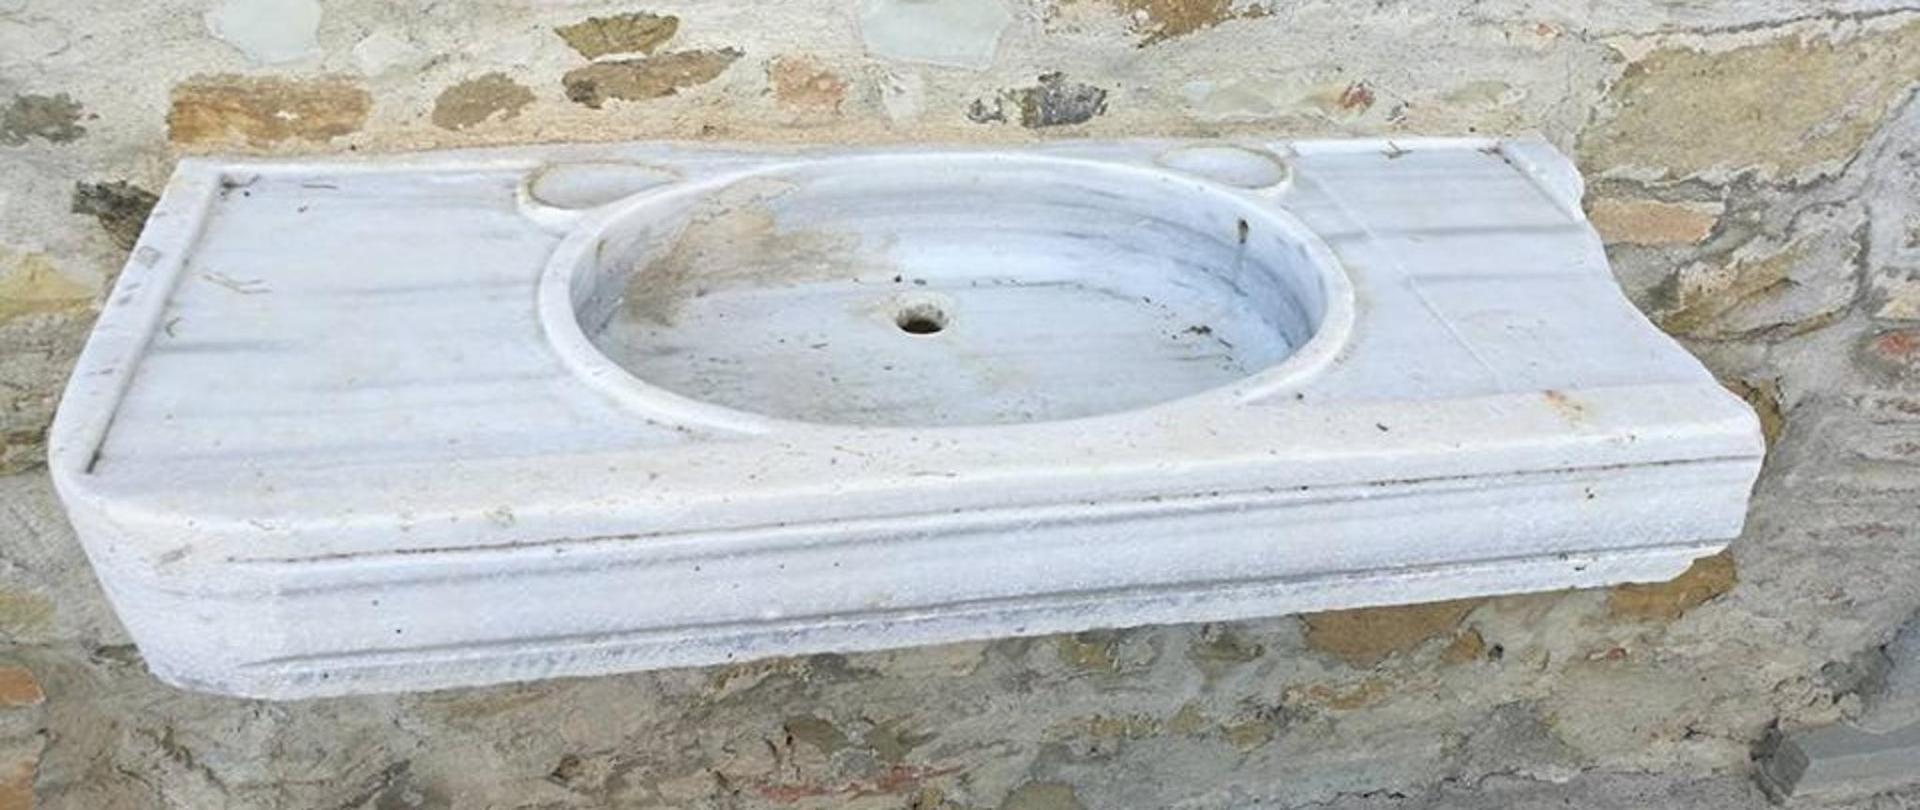 lavandino-di-marmo-1.jpg